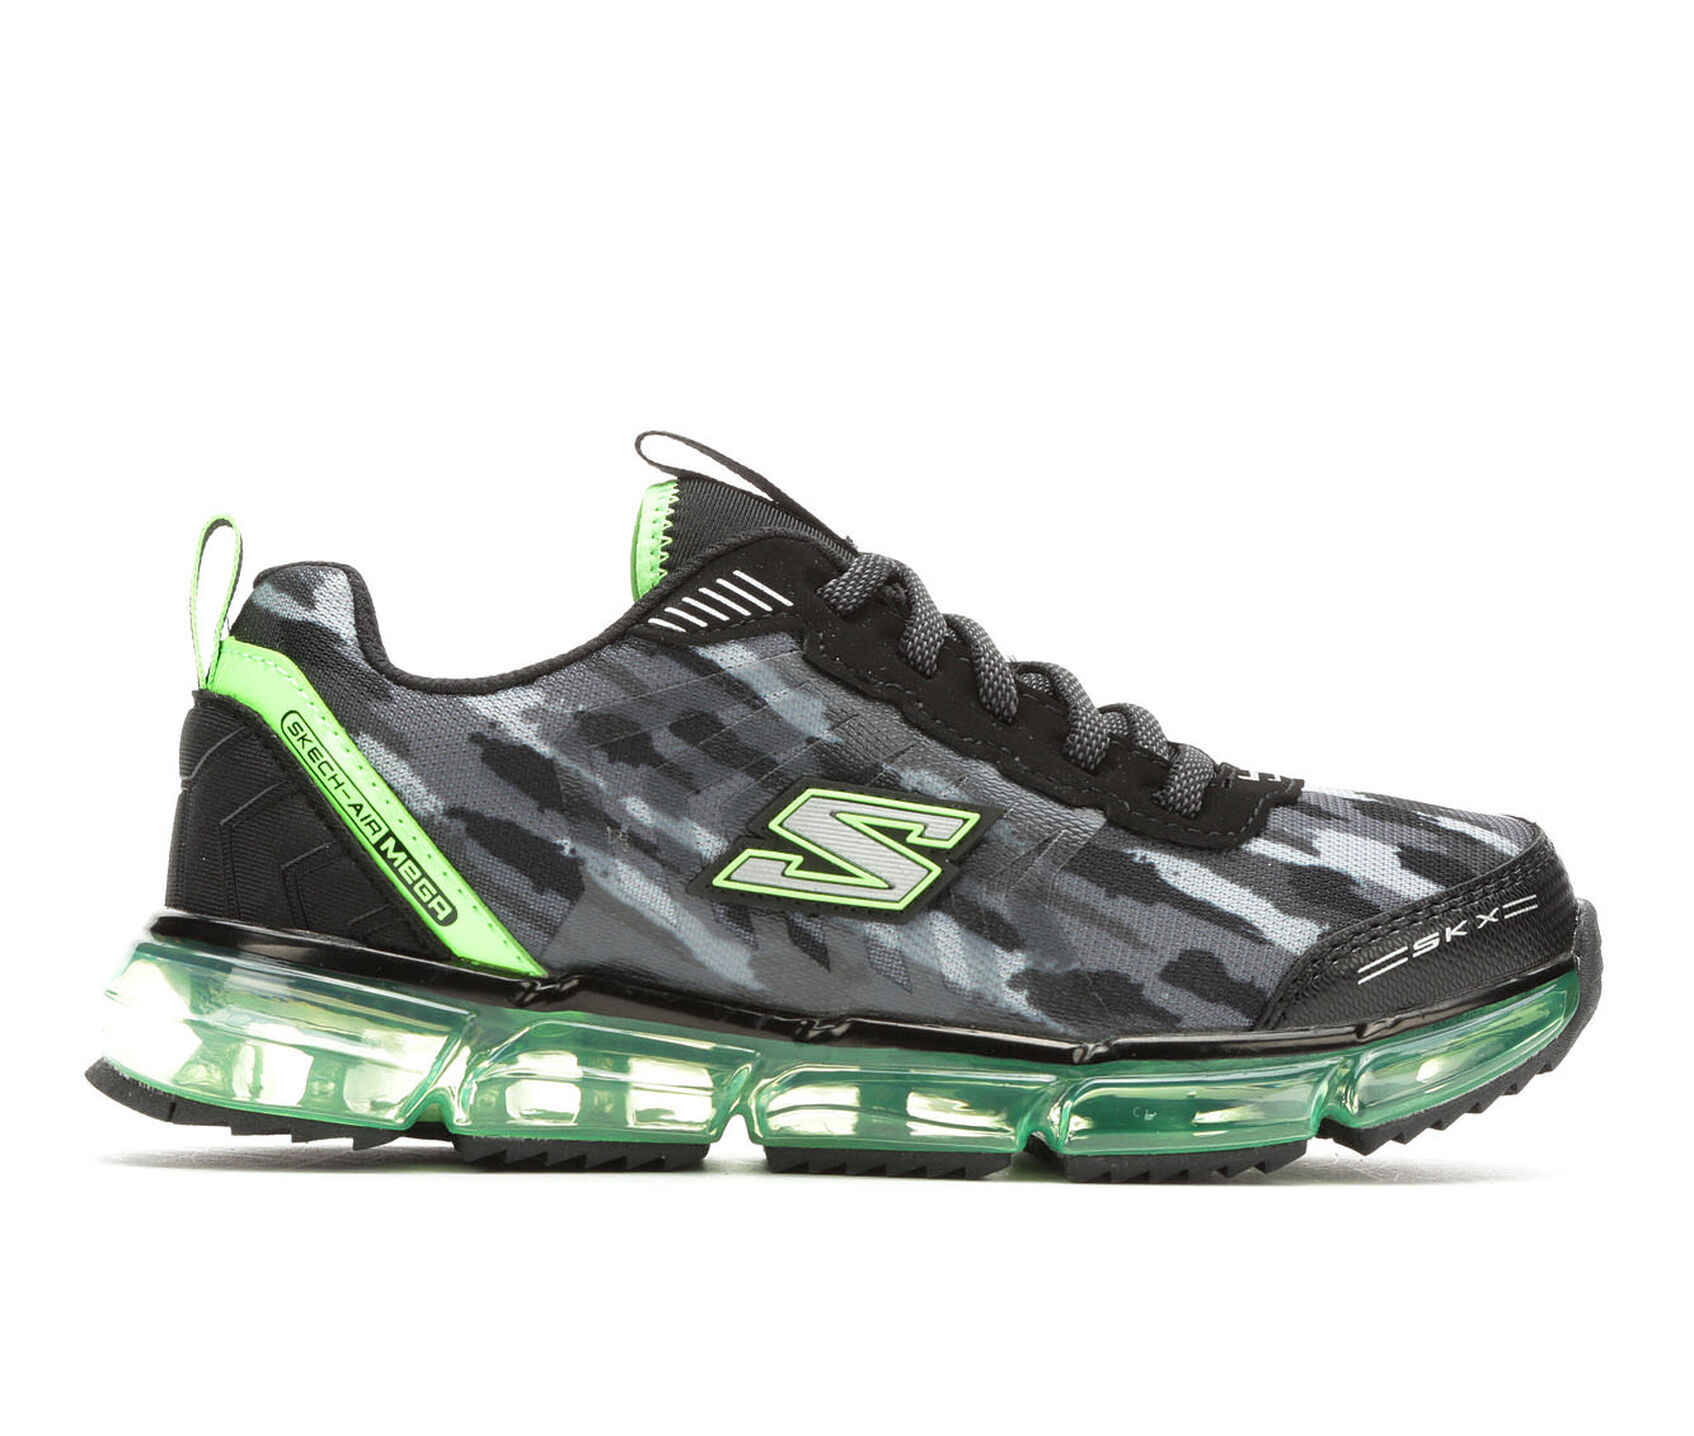 27bcc960fa78 Boys  Skechers Little Kid   Big Kid Skech Air Mega Running Shoes ...